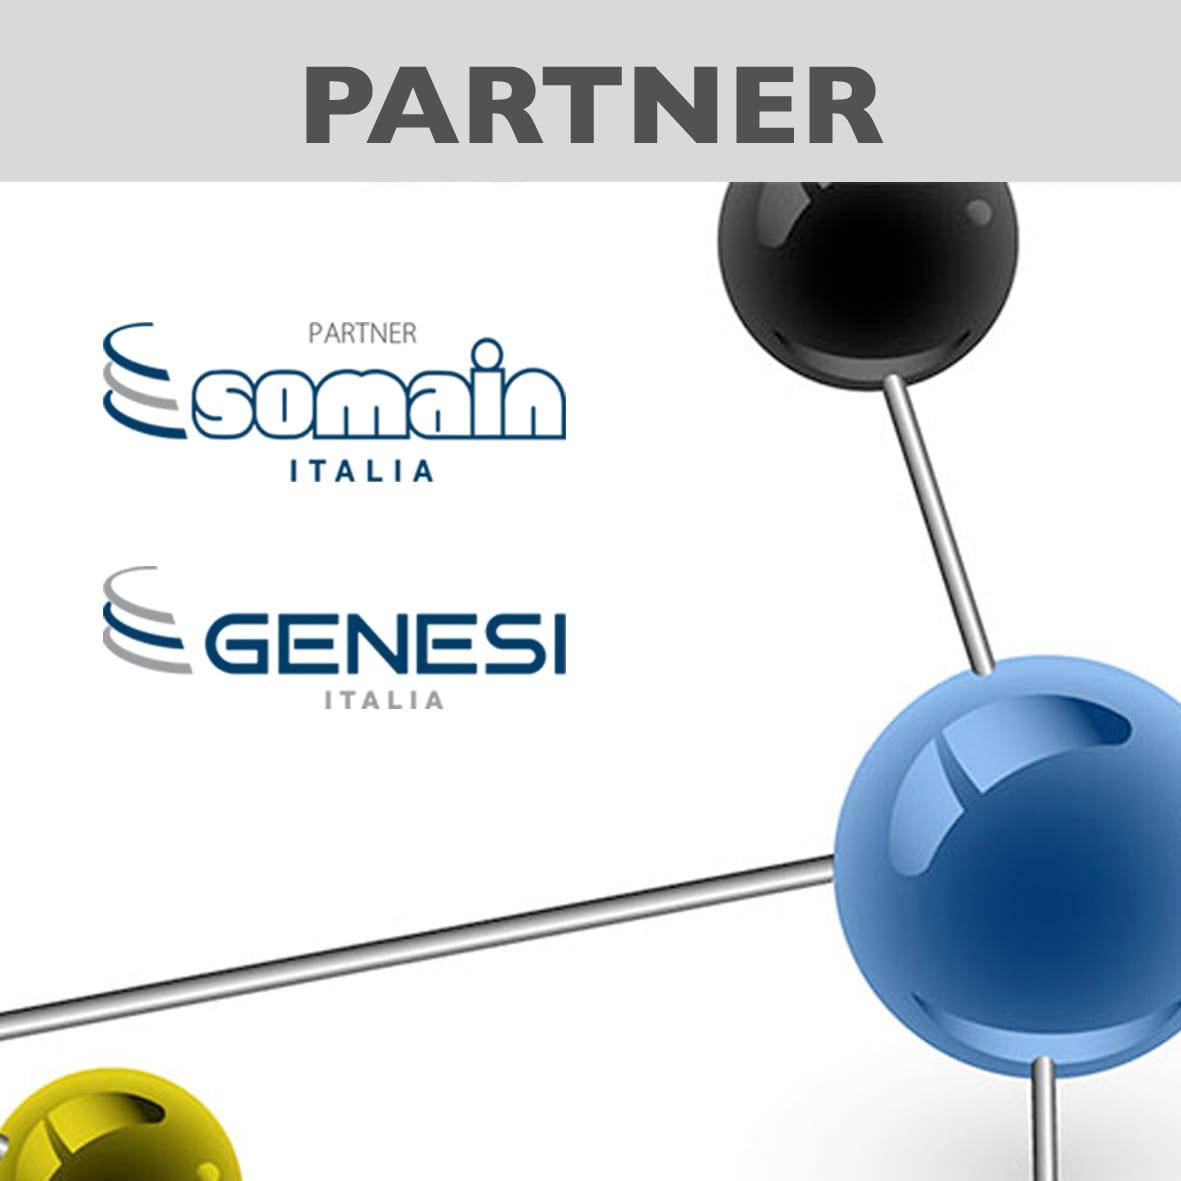 Sistemi Anticaduta è partner di Somain Italia